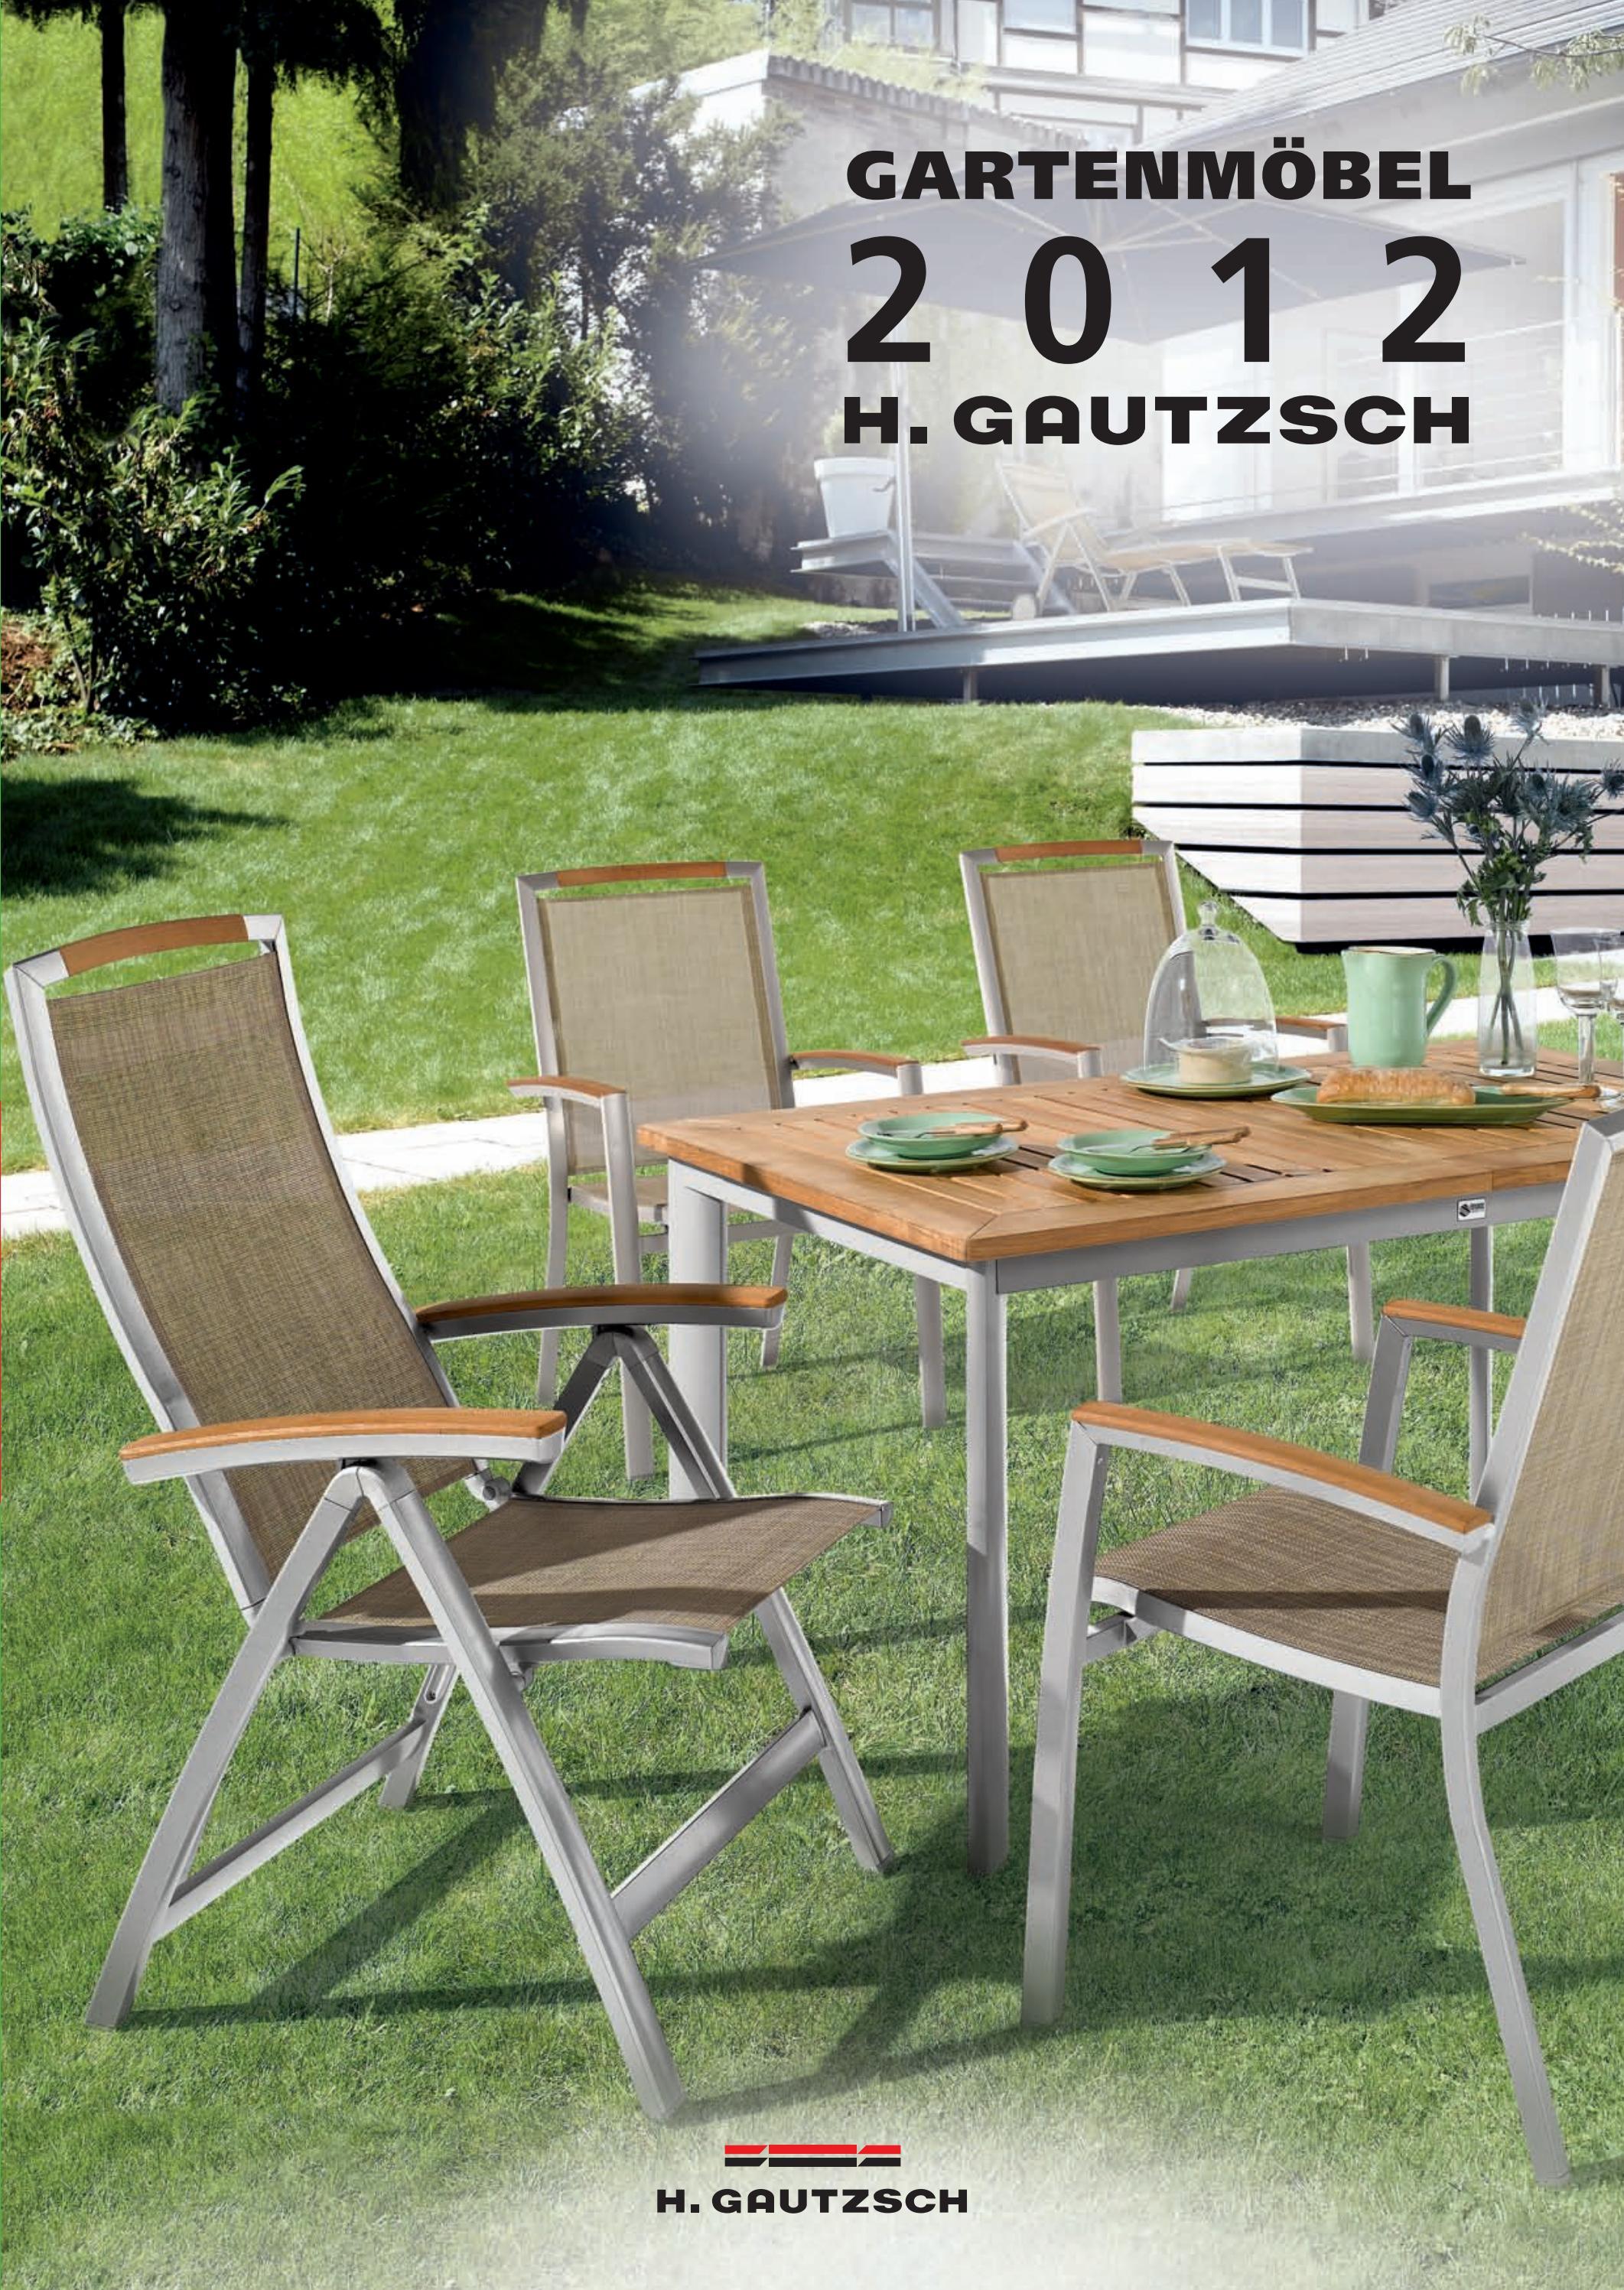 gartenm bel 2012 by firma adocom issuu. Black Bedroom Furniture Sets. Home Design Ideas